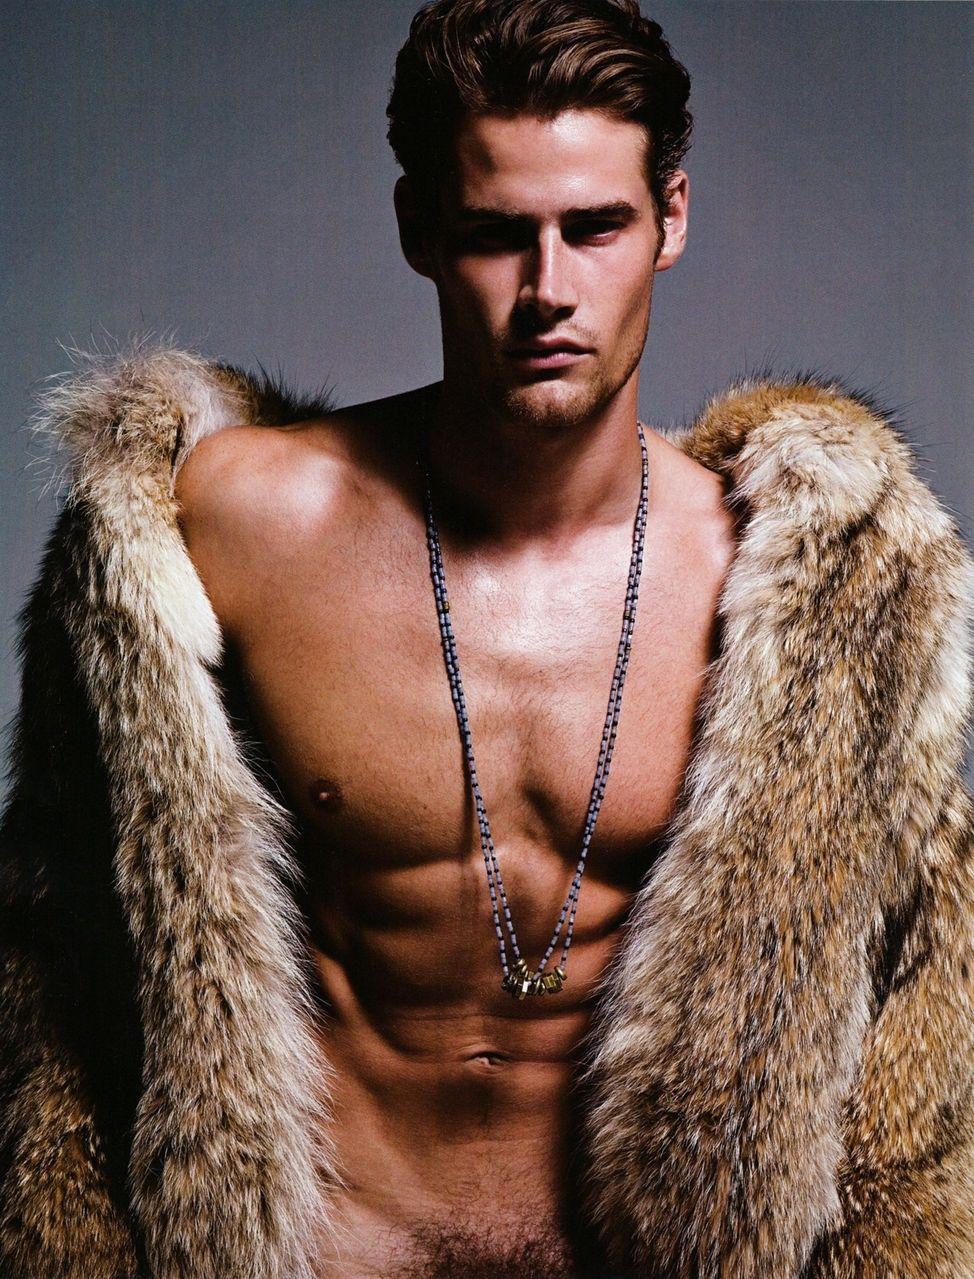 men naked with fur